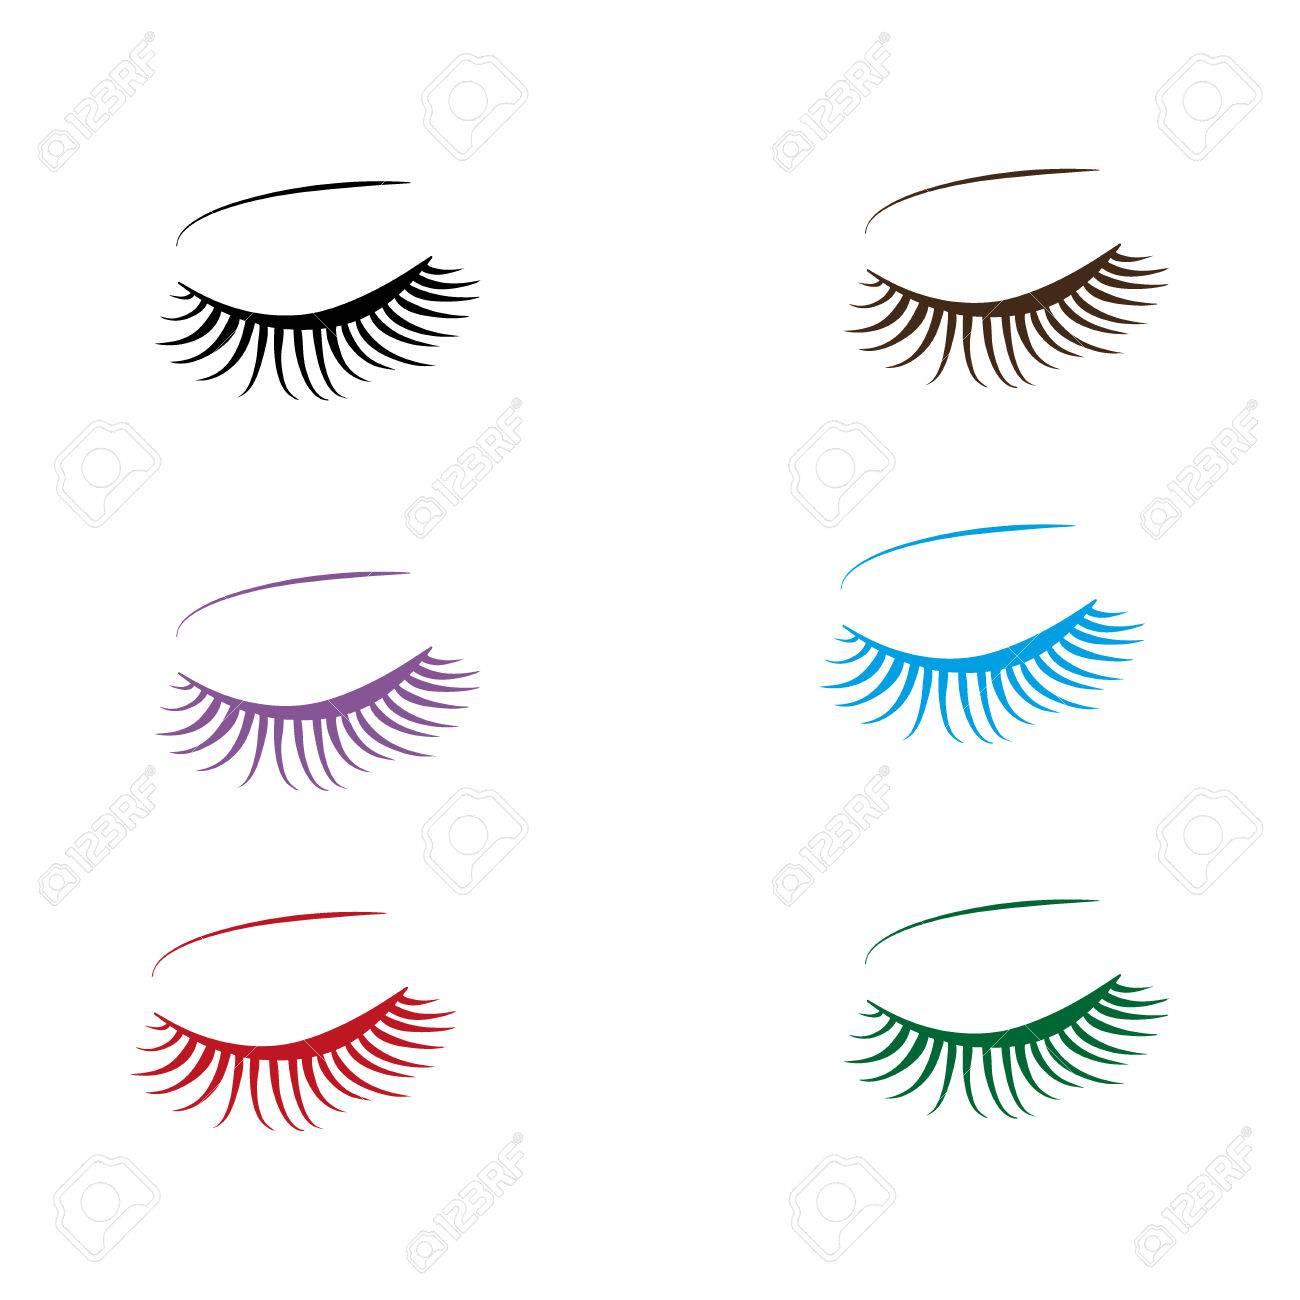 colorful Eyelashes and eyebrows - 58679794